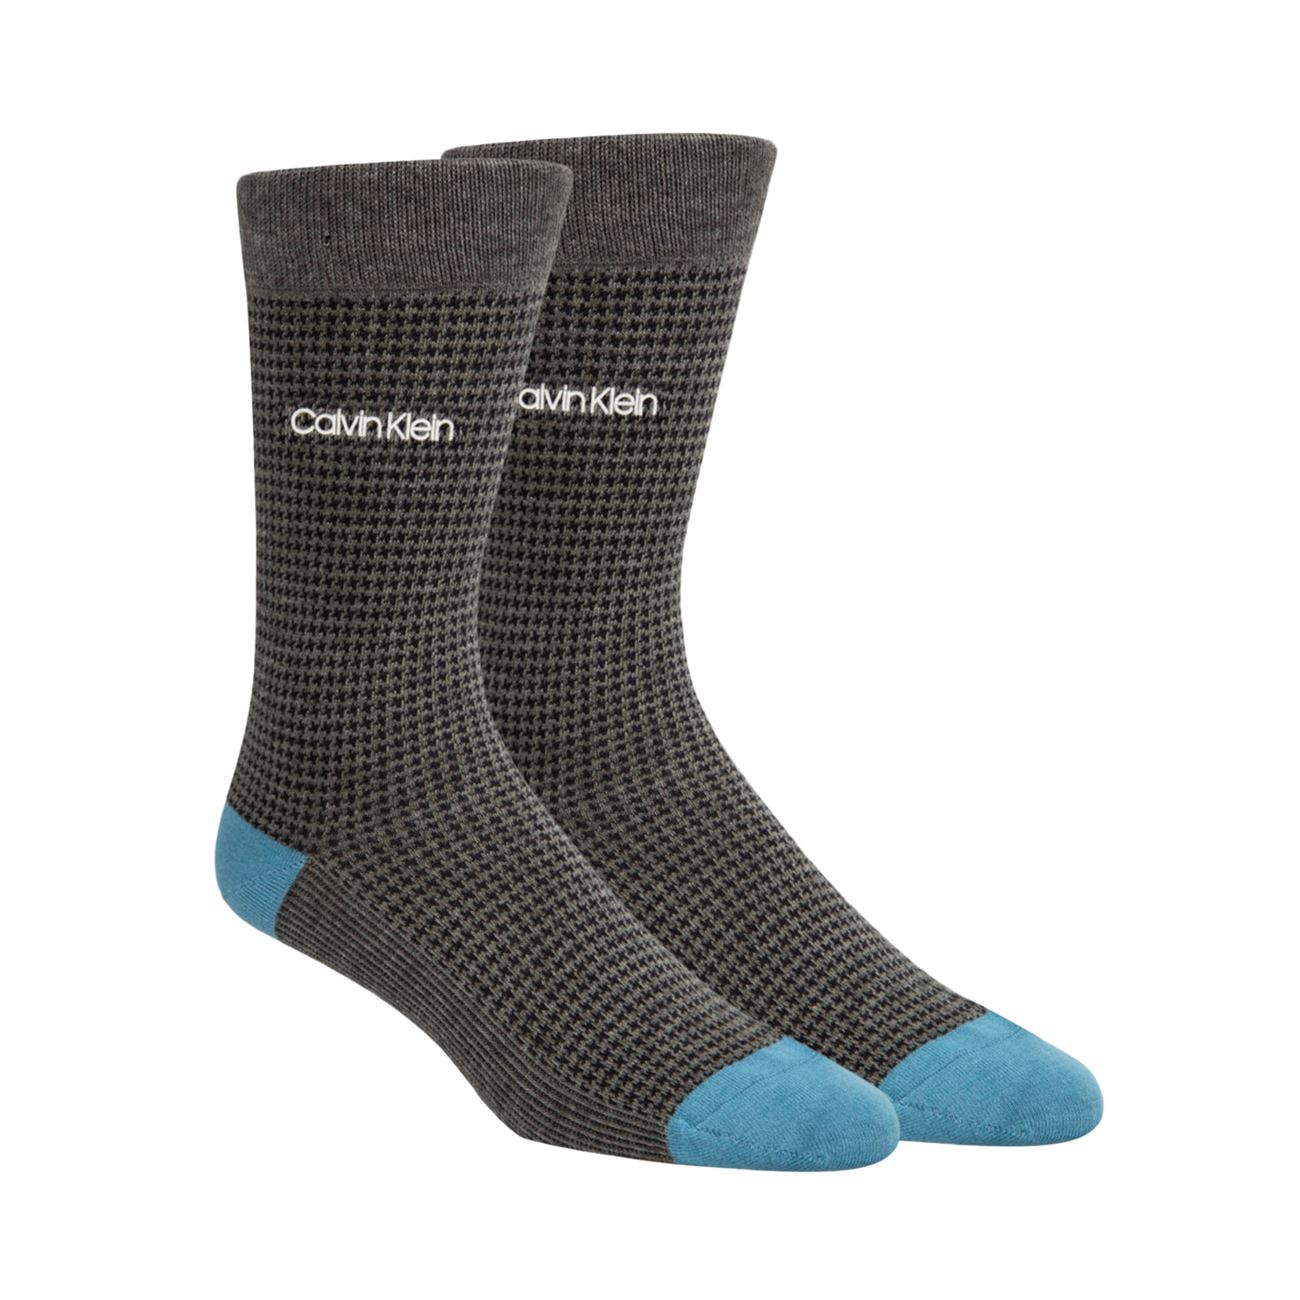 6fc603300e Calvin Klein Ανδρικές Κάλτσες Hounds Tooth Crew Μαύρο - Glami.gr